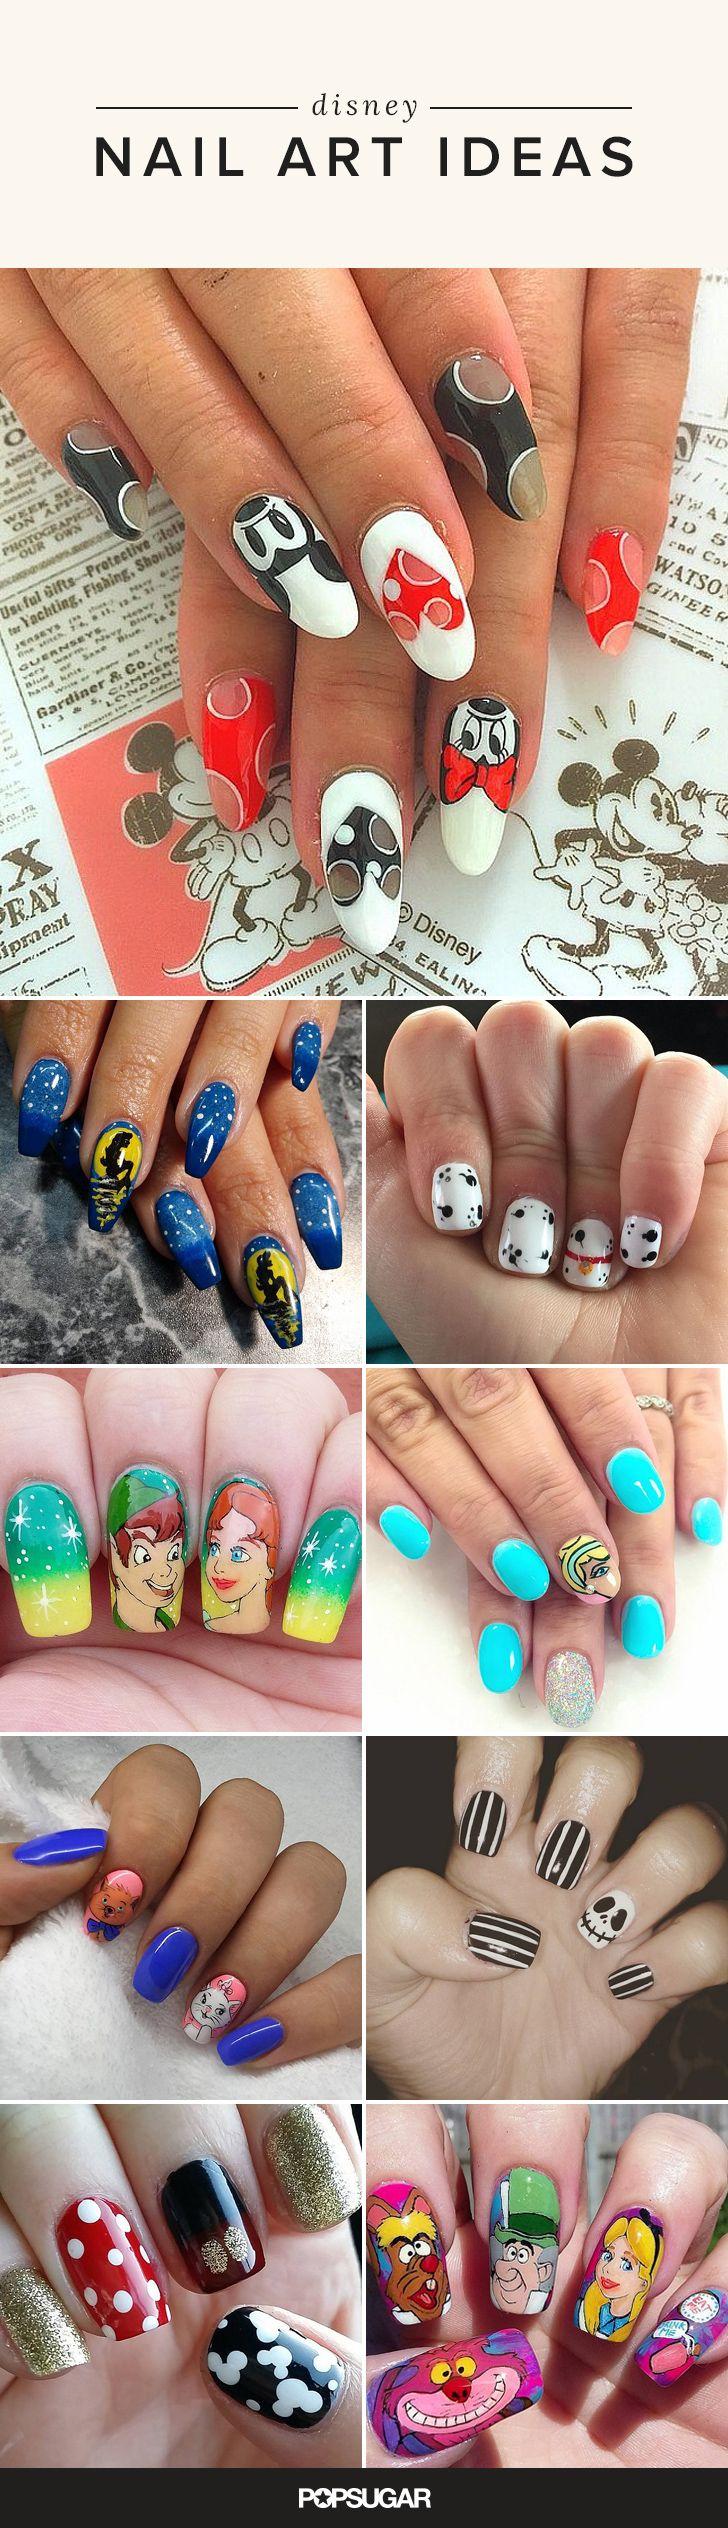 Top Ten Beauty Ideas Of 2013   Princess, Disney princess nails and ...